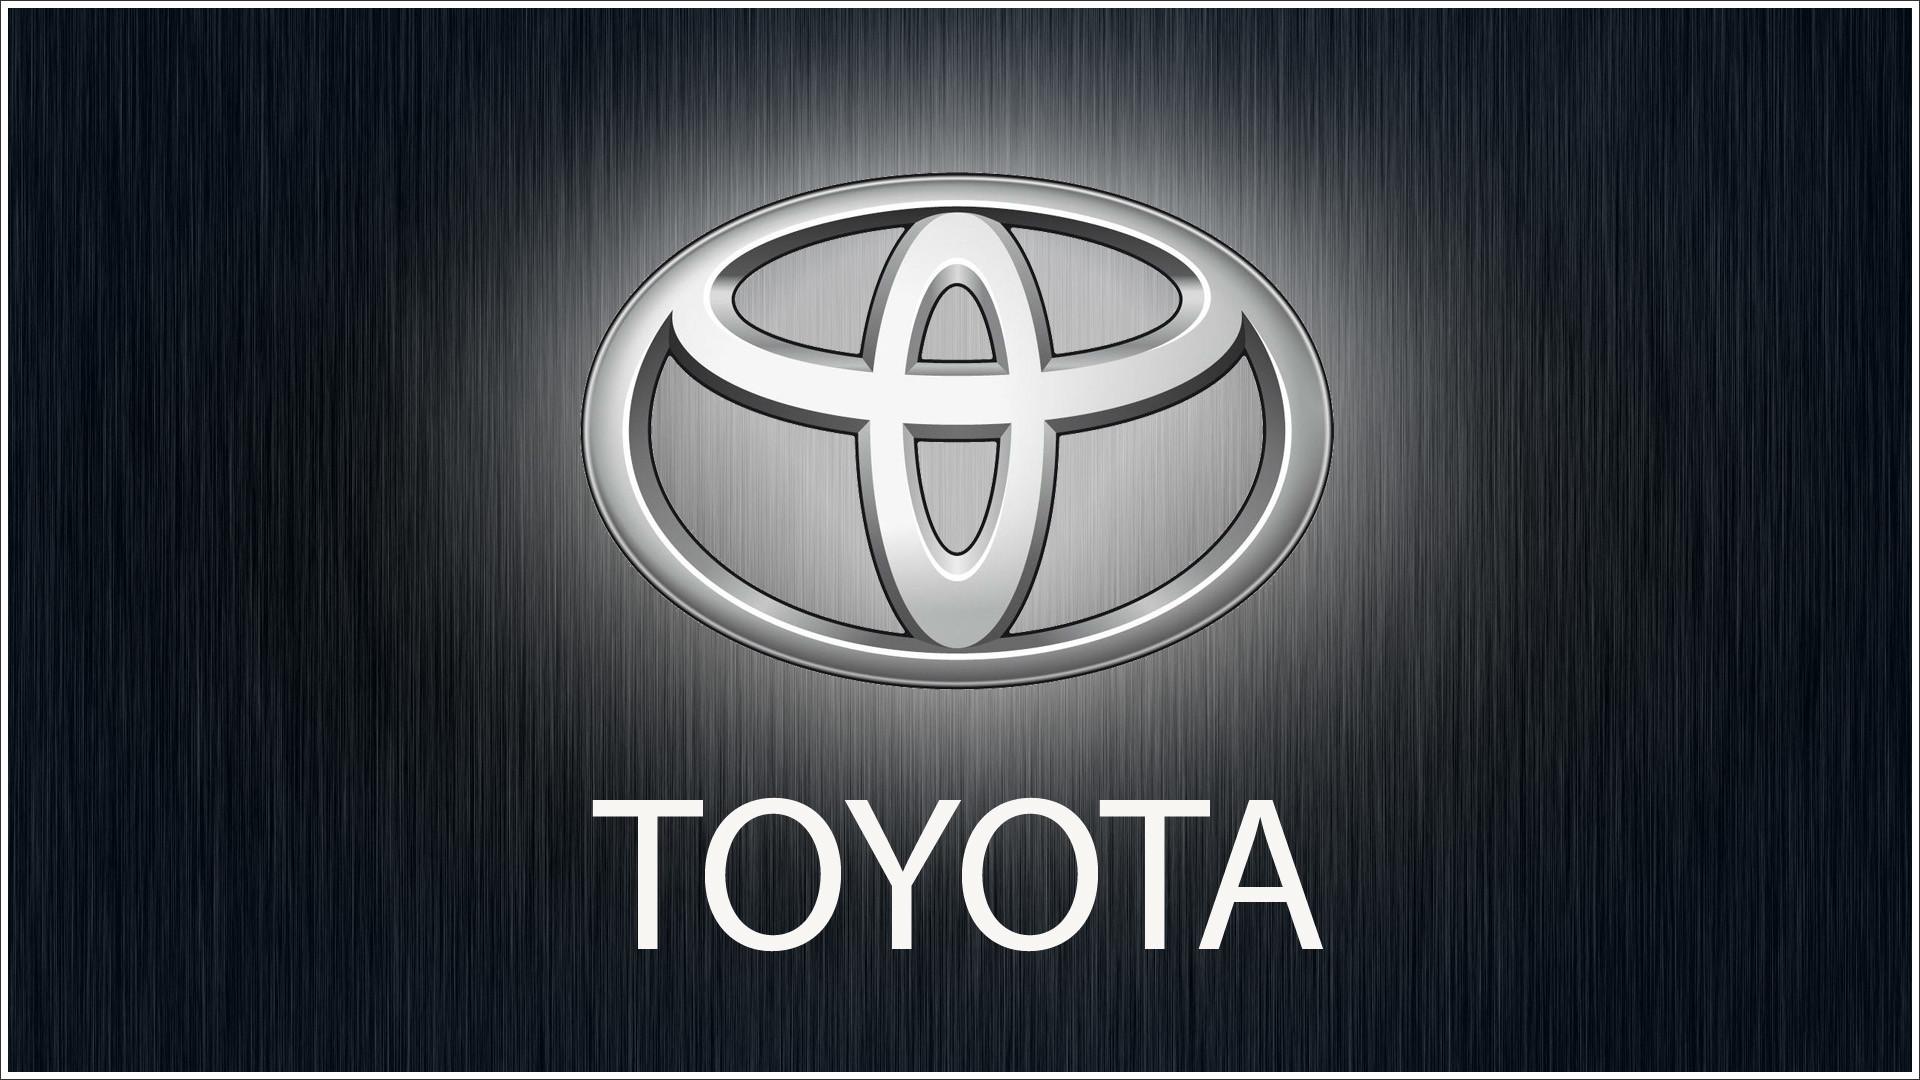 Toyota logo description